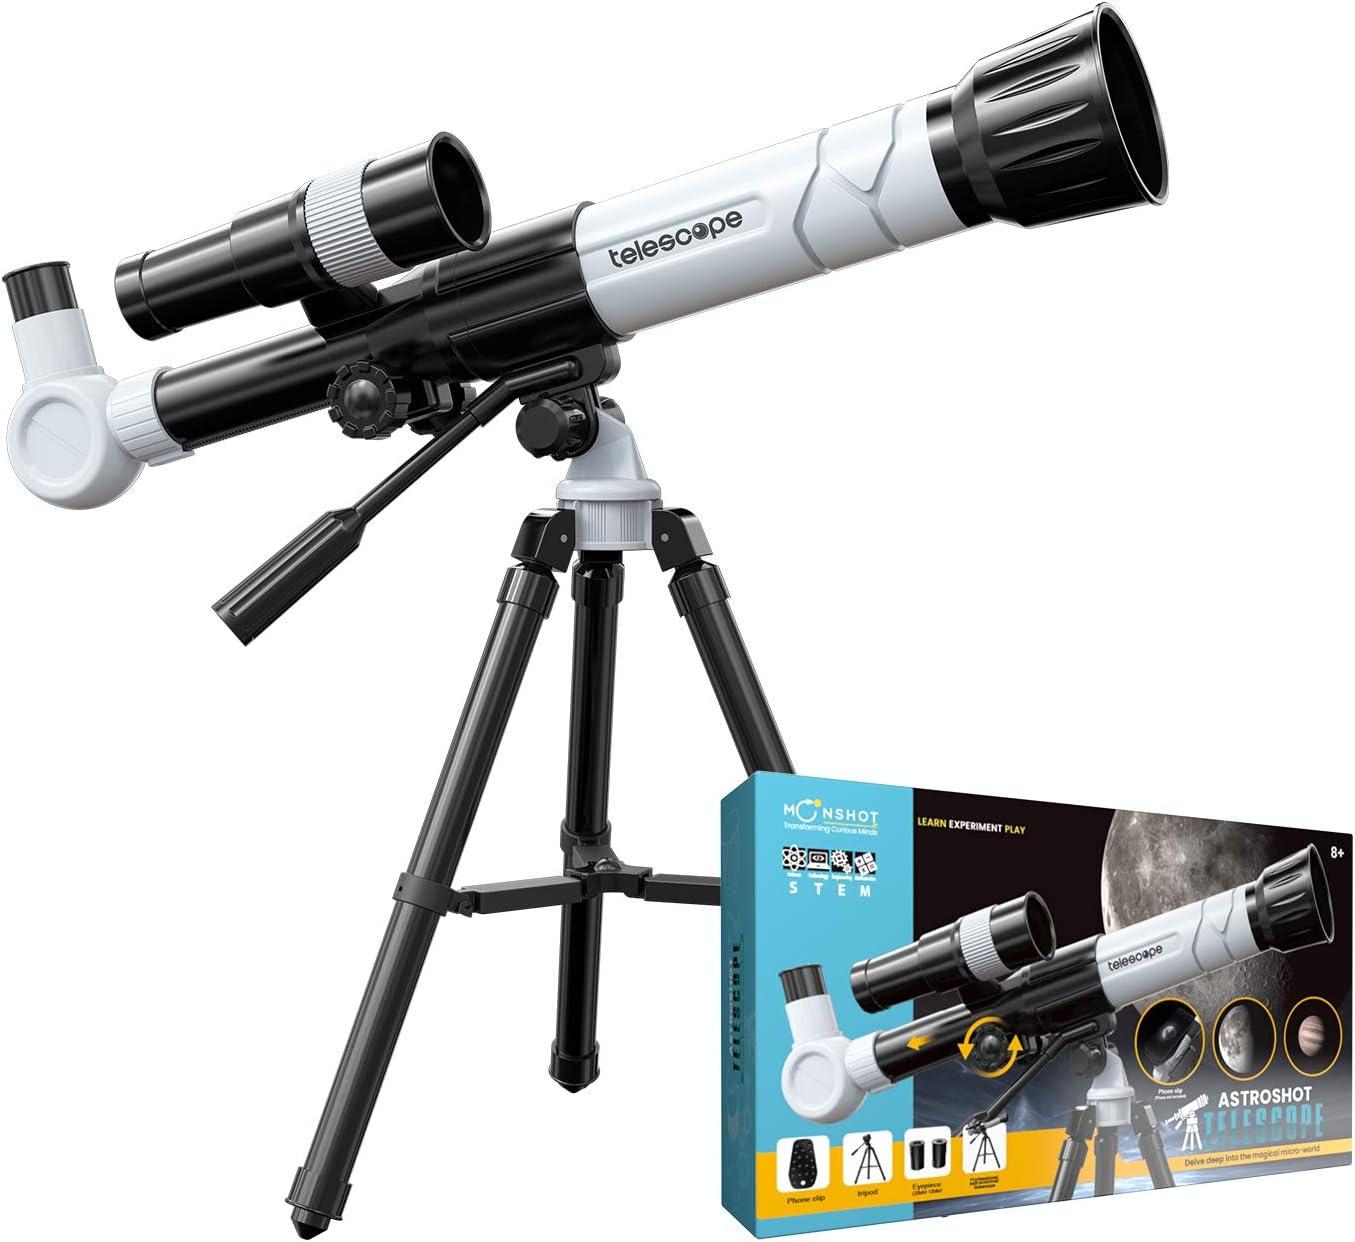 Moonshotjr San Antonio Mall Astroshot Kids Telescope - Limited price sale Toy Astronomy Educational